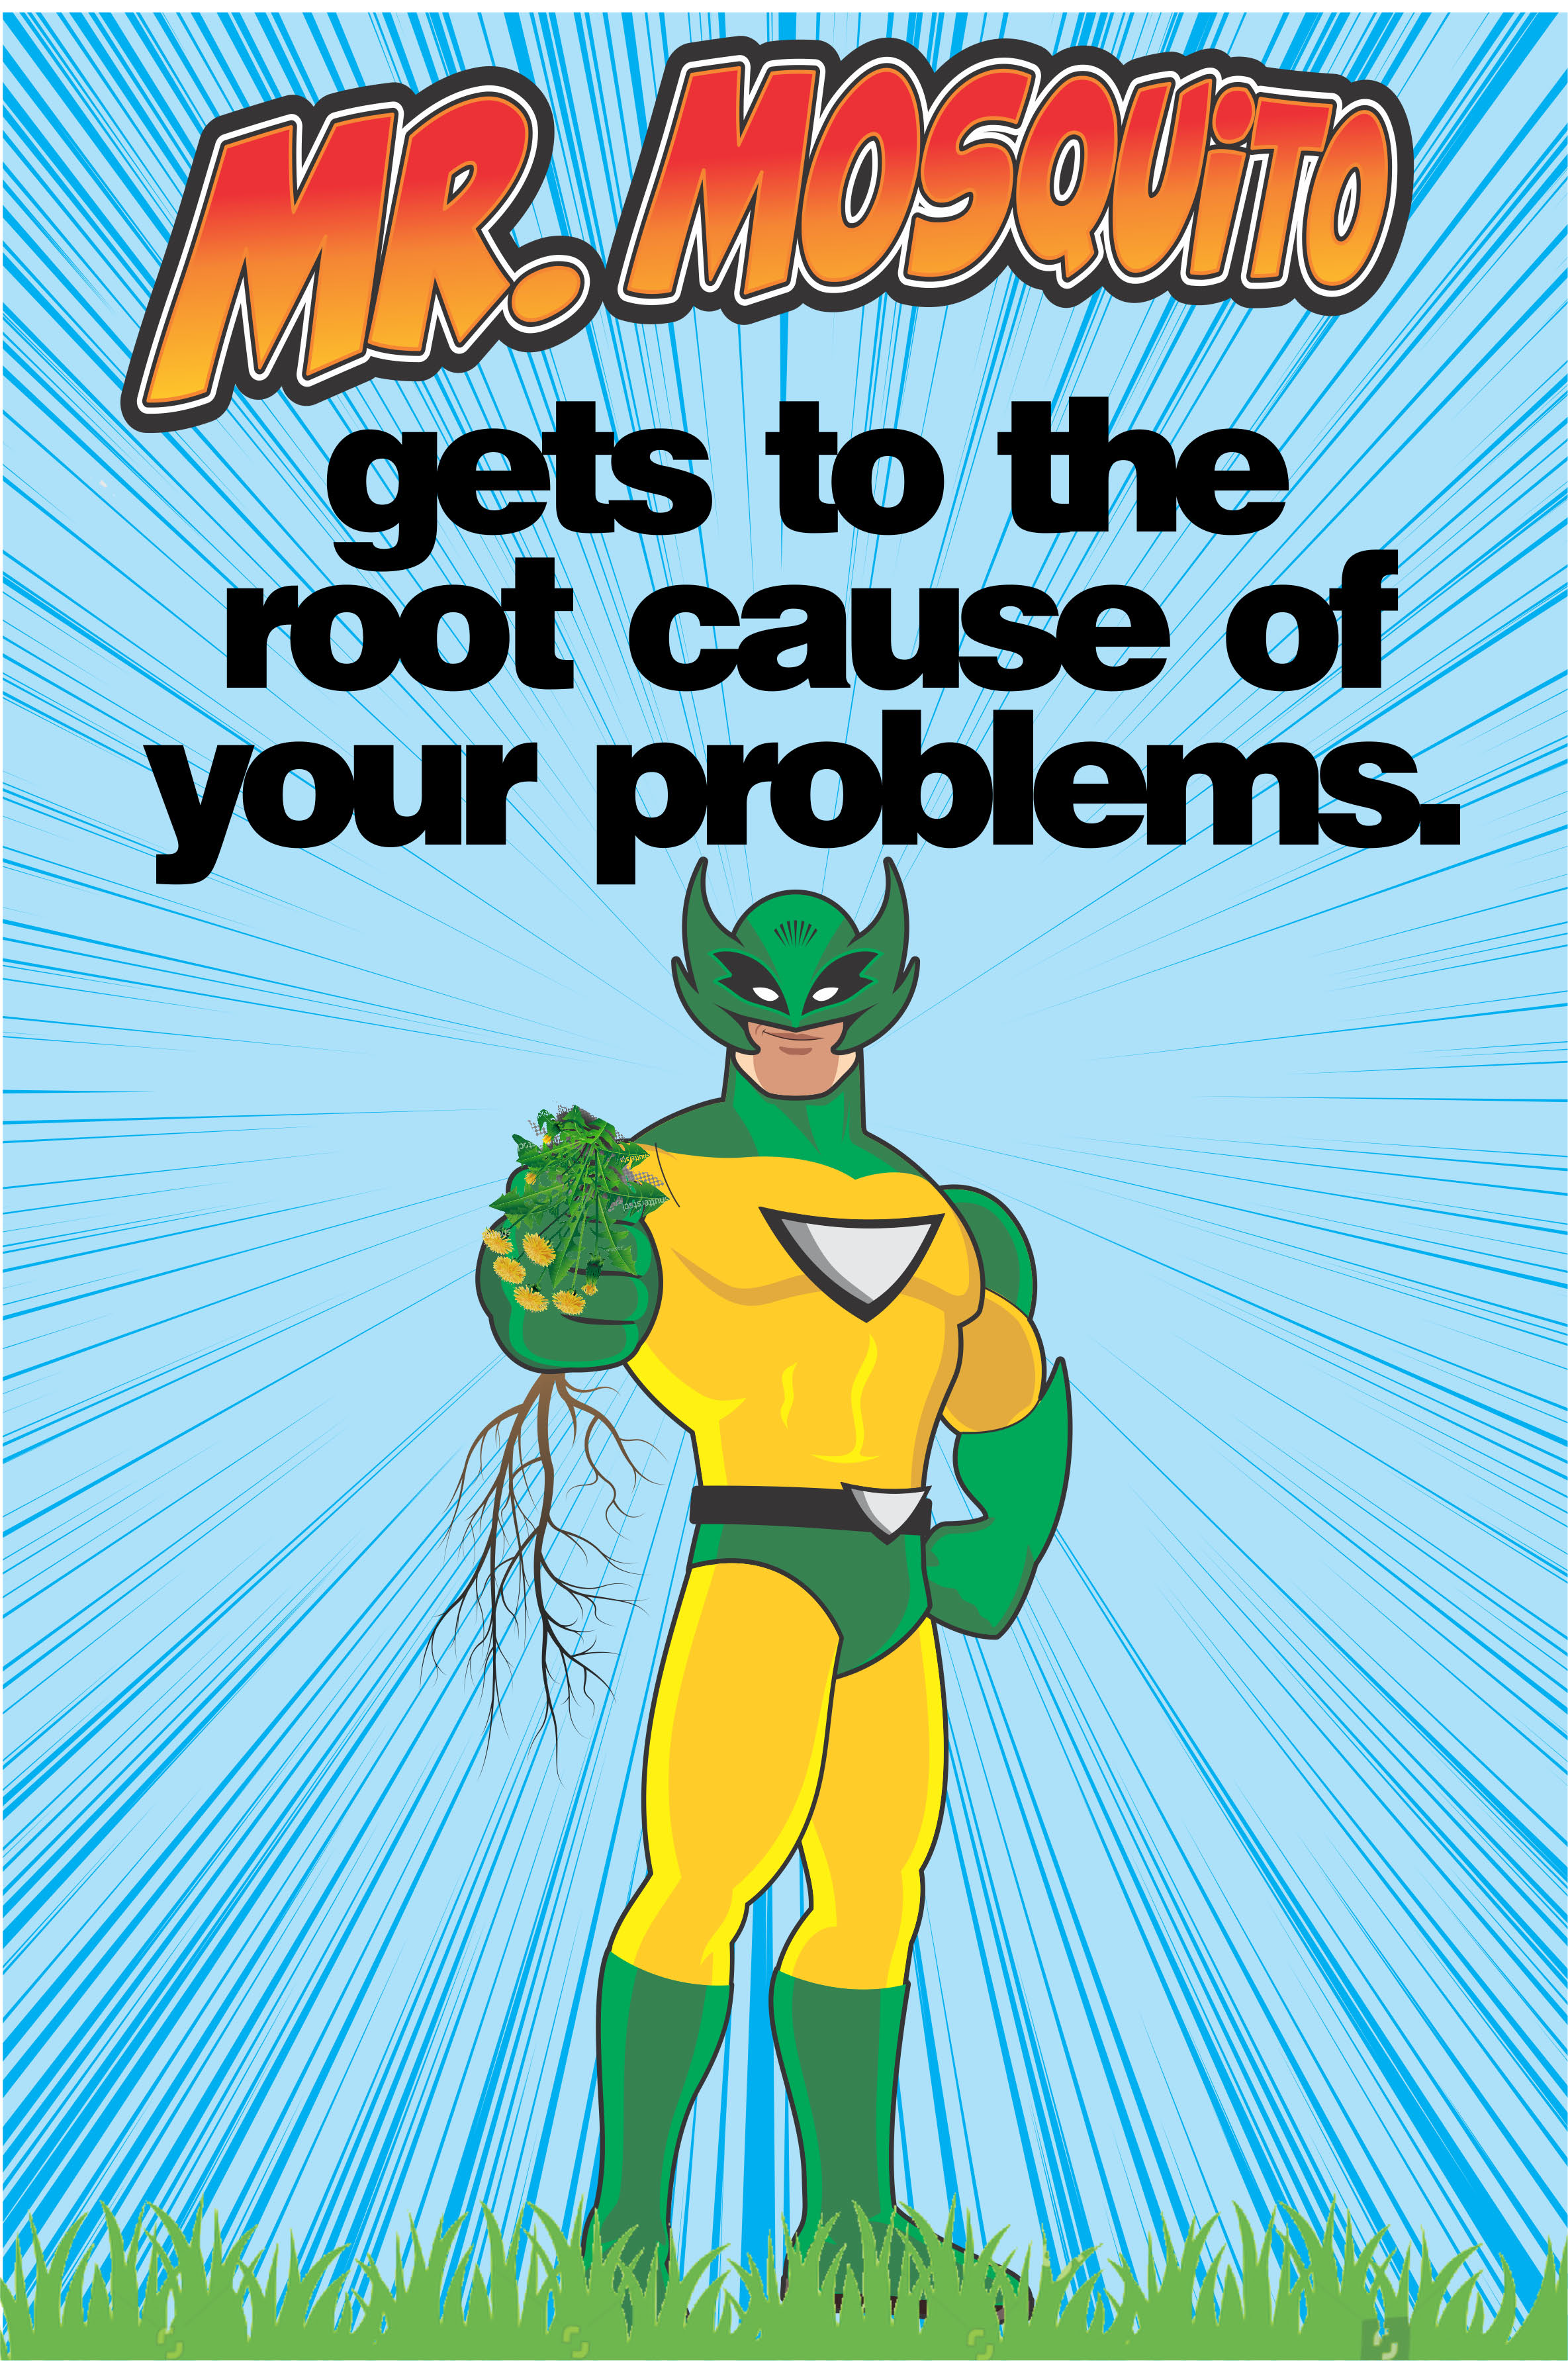 https://mrmosquitony.com/wp-content/uploads/2021/04/Mosquito-poster.png